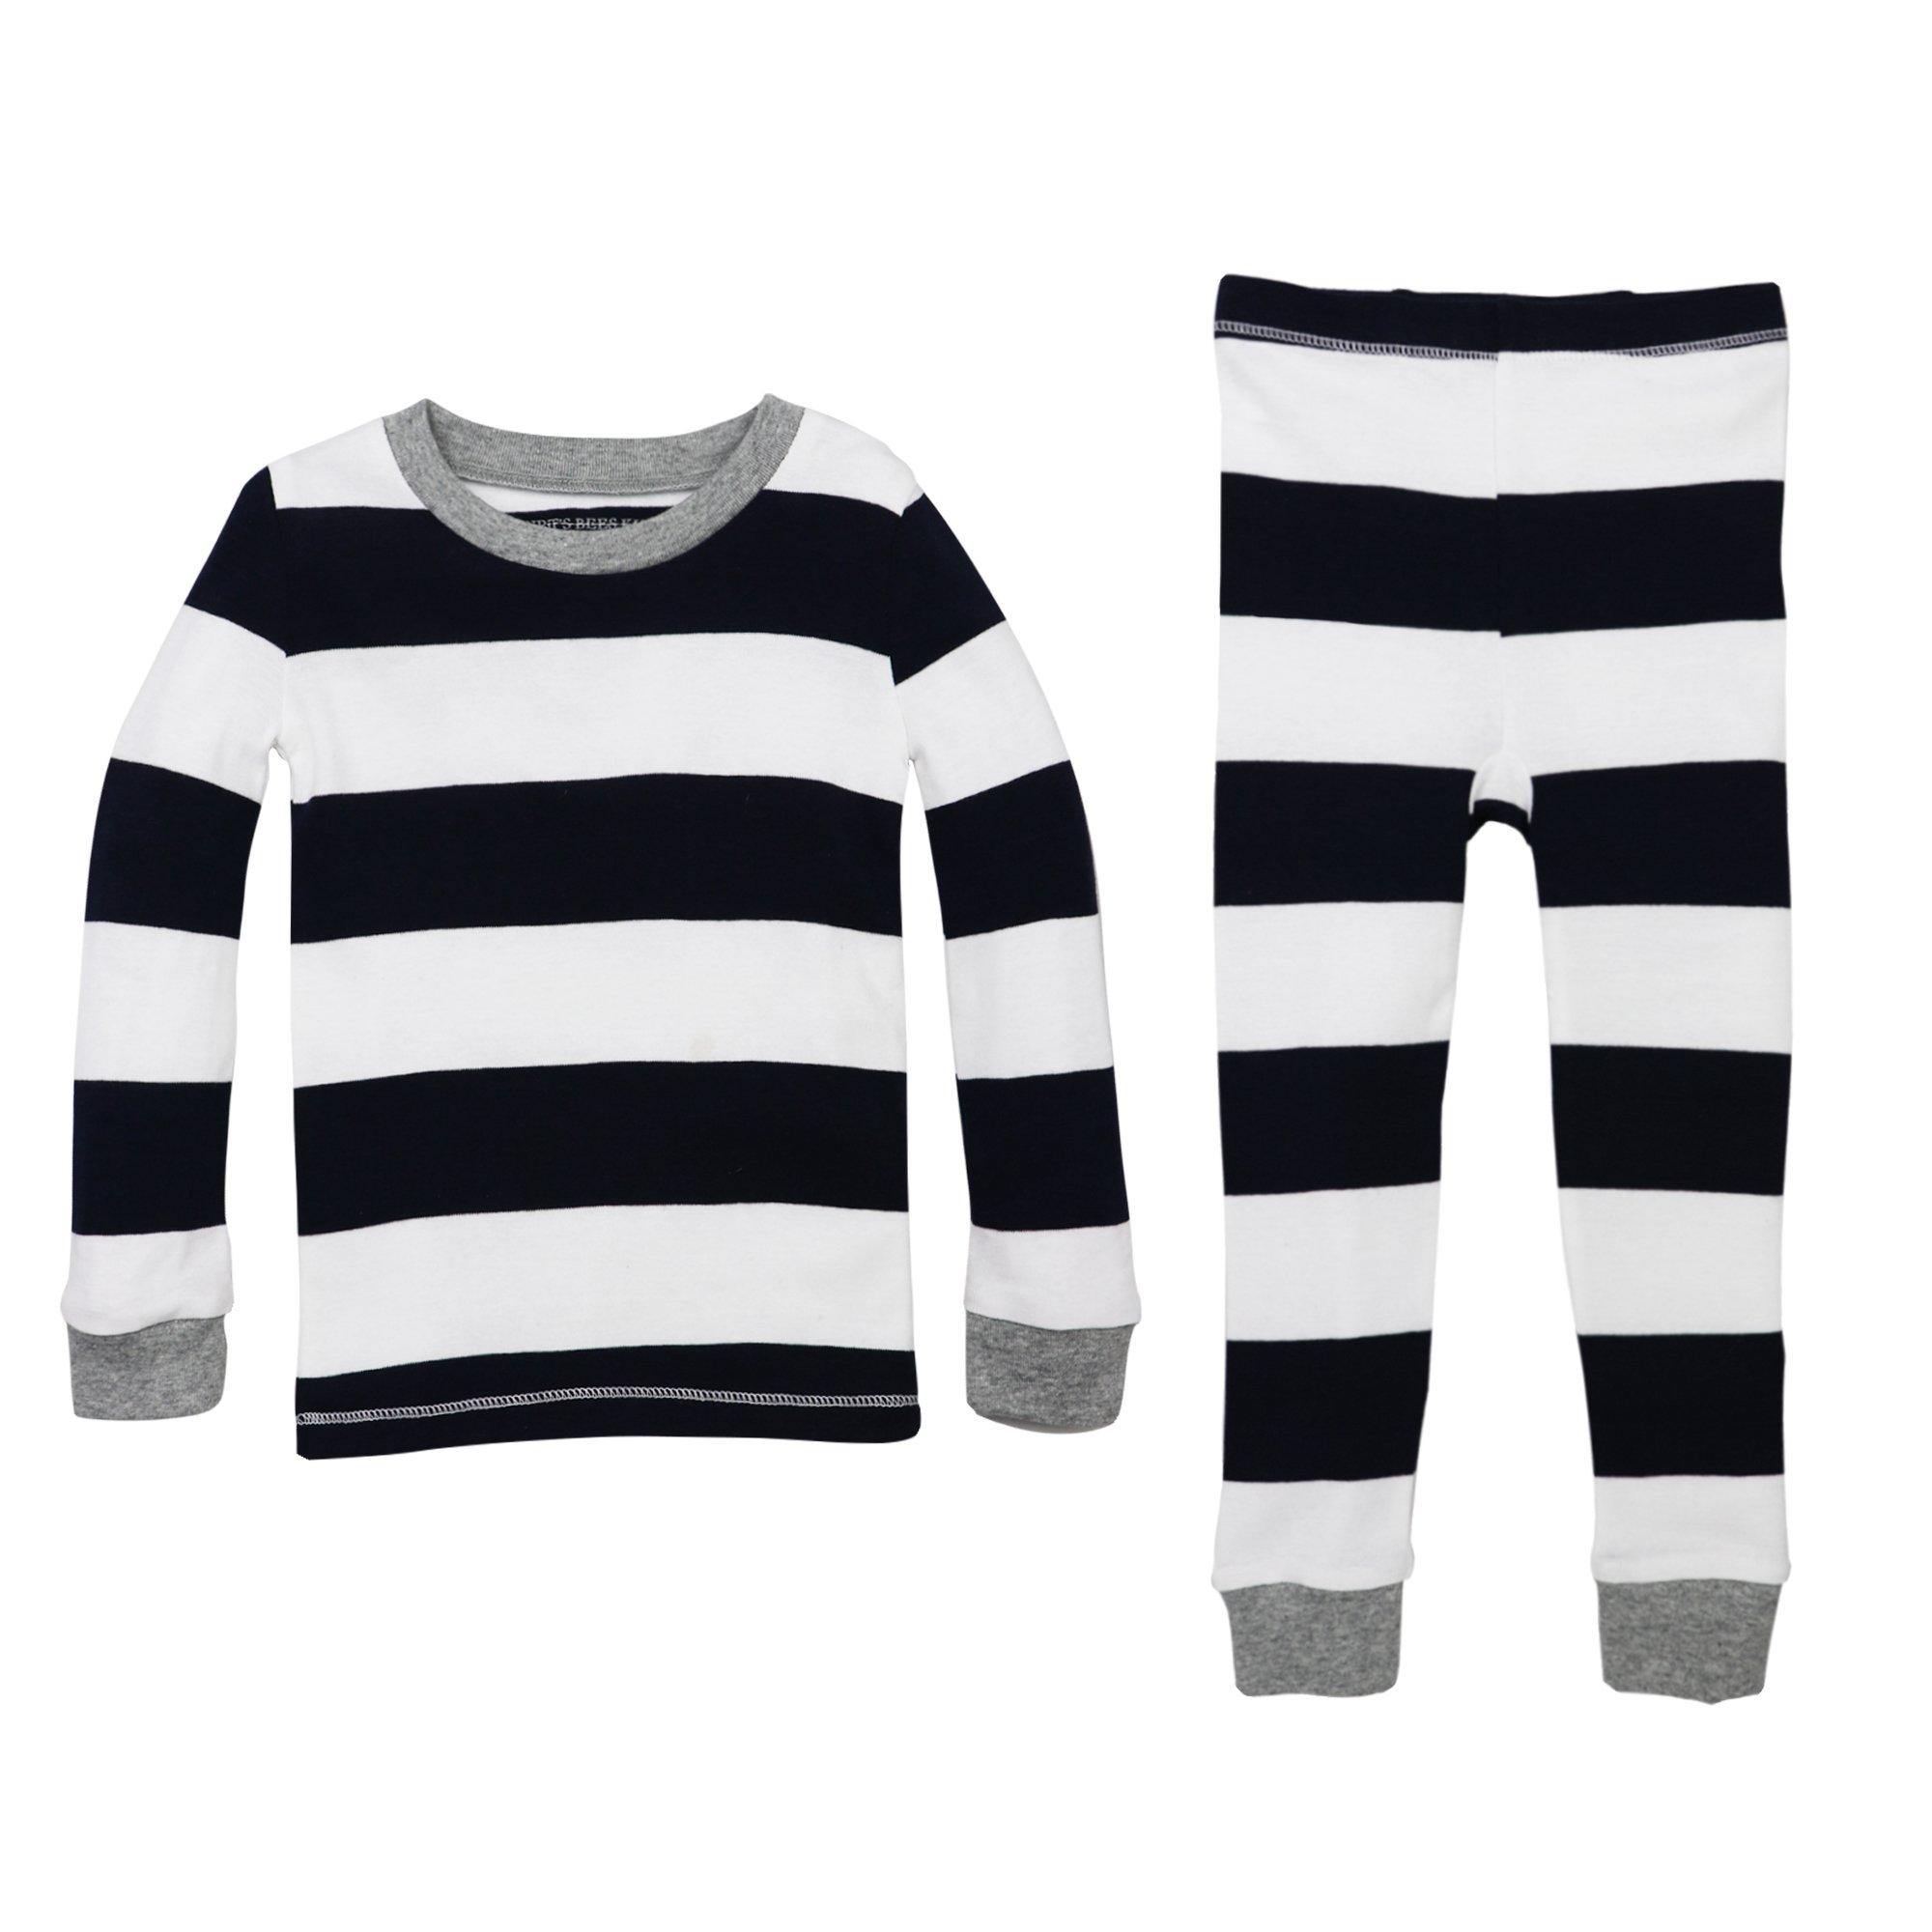 Burt's Bees Baby Unisex Little Kid Pajamas, 2-Piece PJ Set, 100% Organic Cotton (12 Mo-7 Yrs), Midnight Rugby Stripe, 6 Years